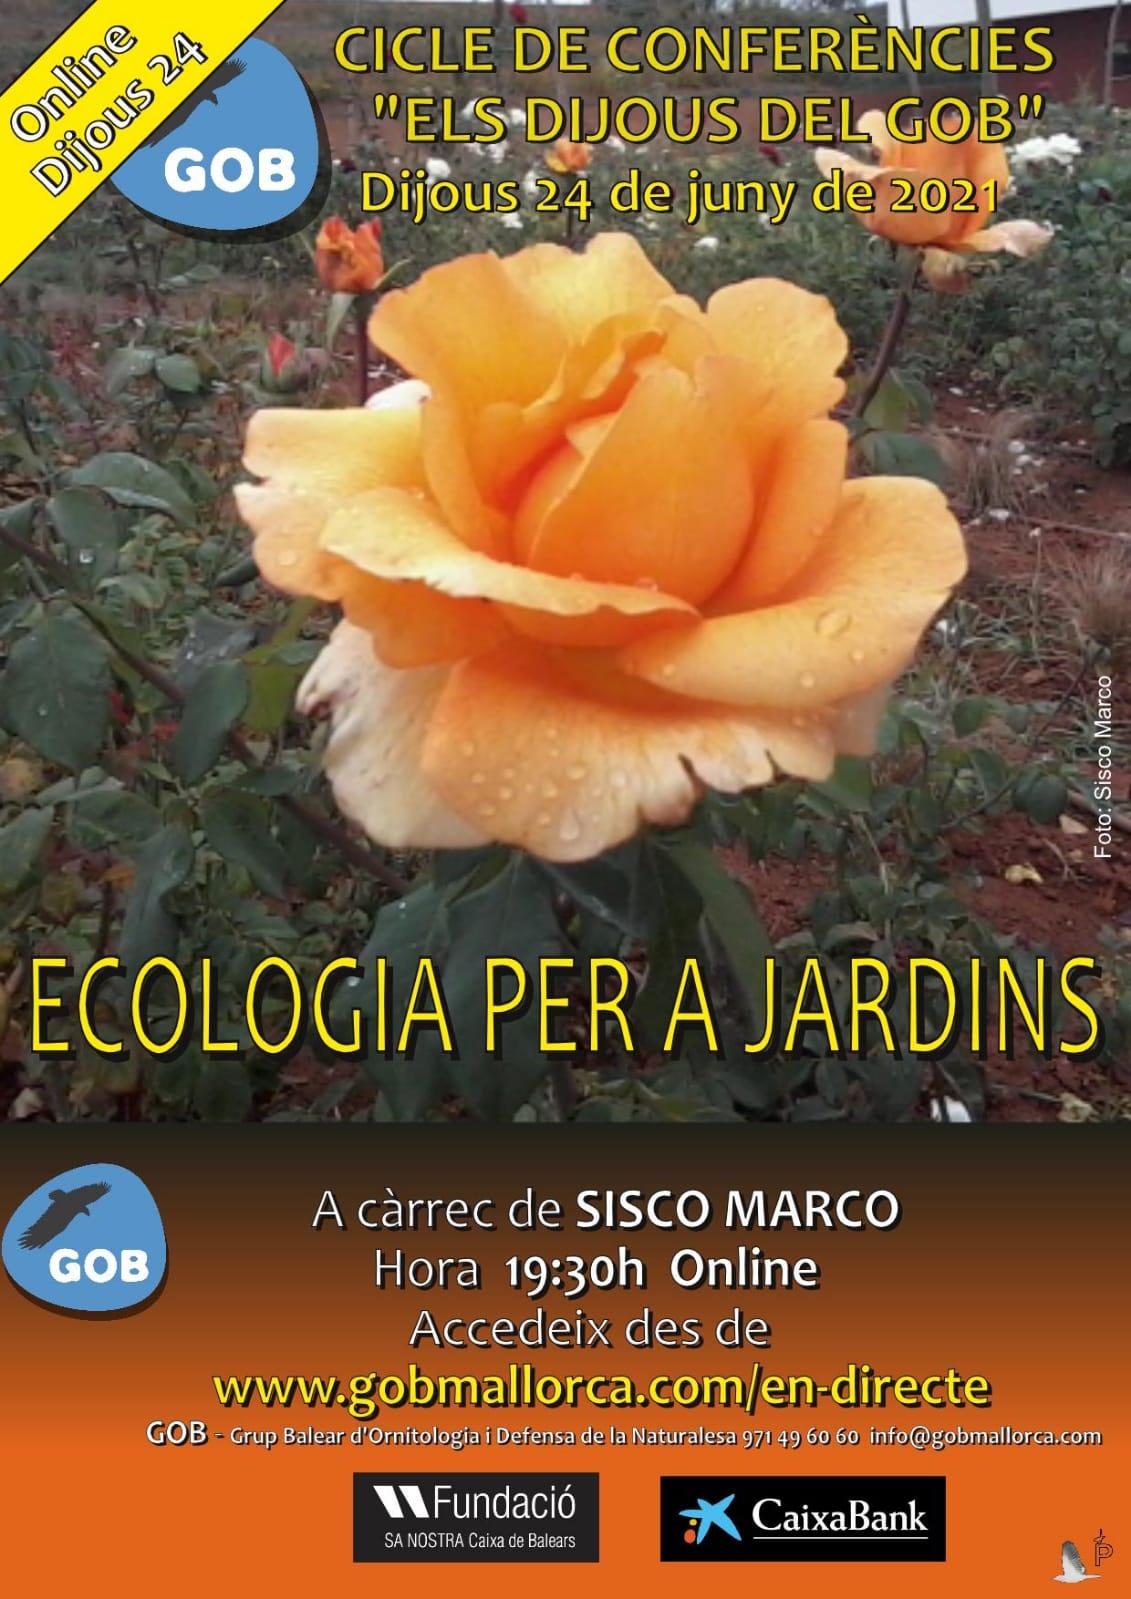 Ecologia per a jardins (24-06-21)